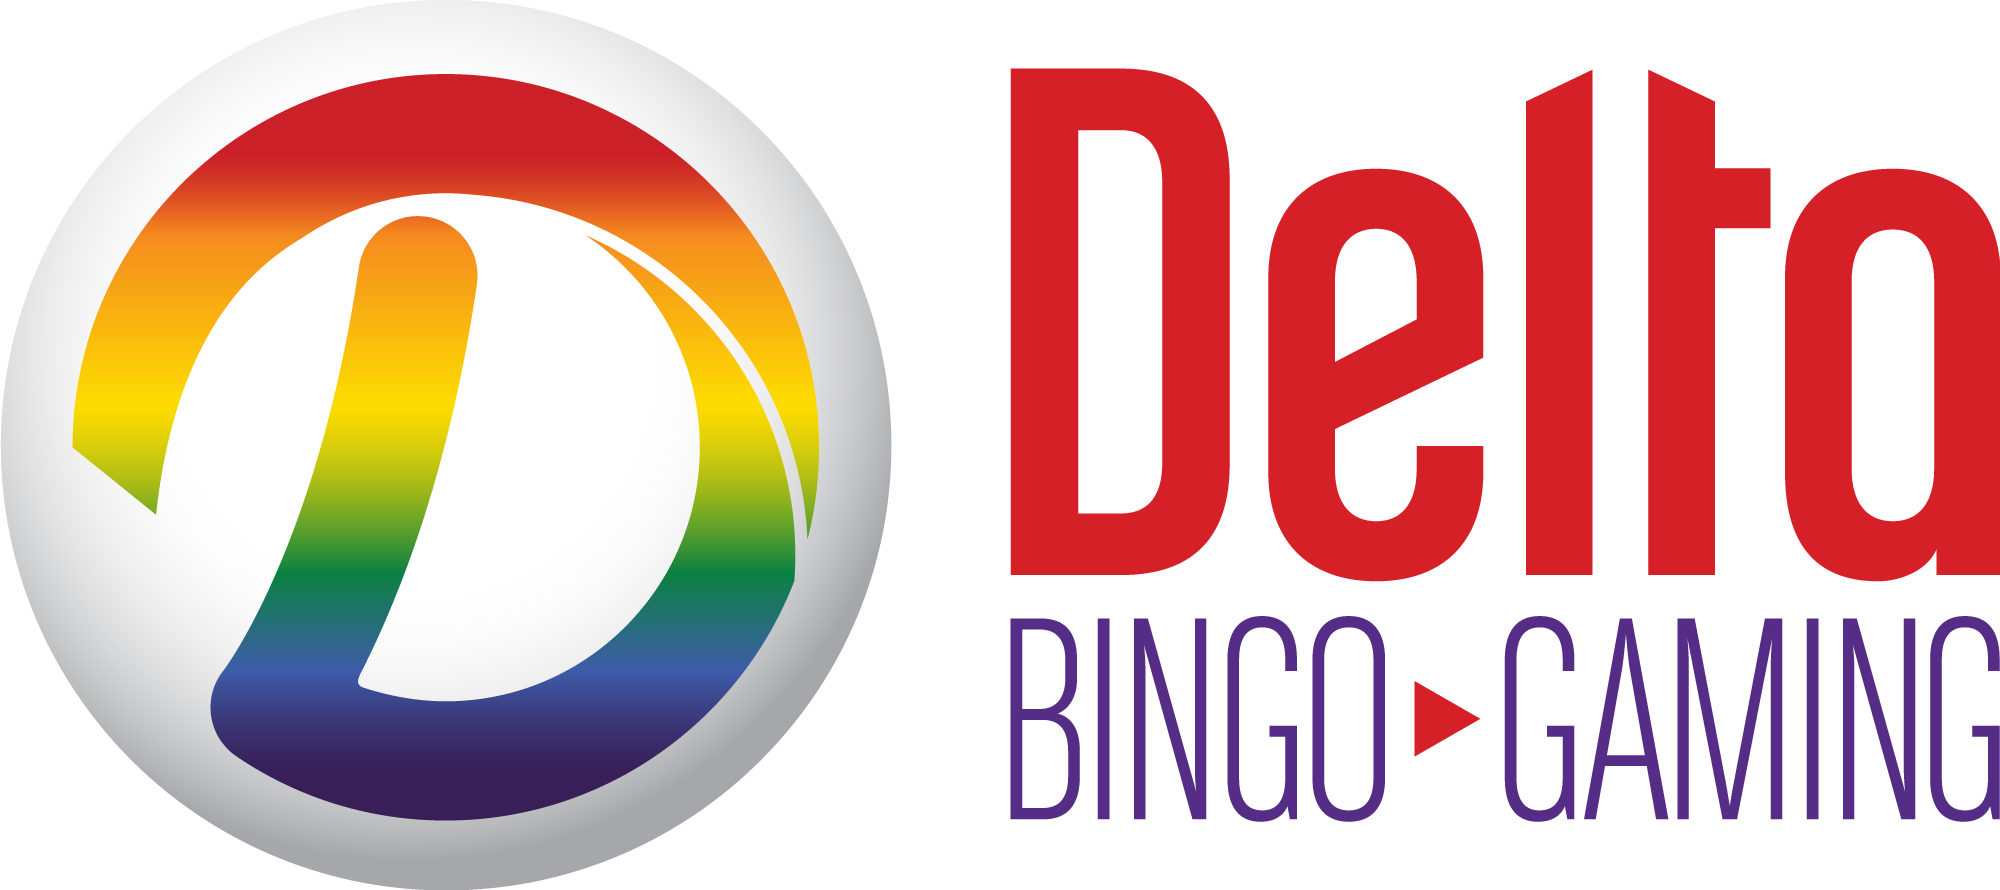 Delta Bingo & Gaming.